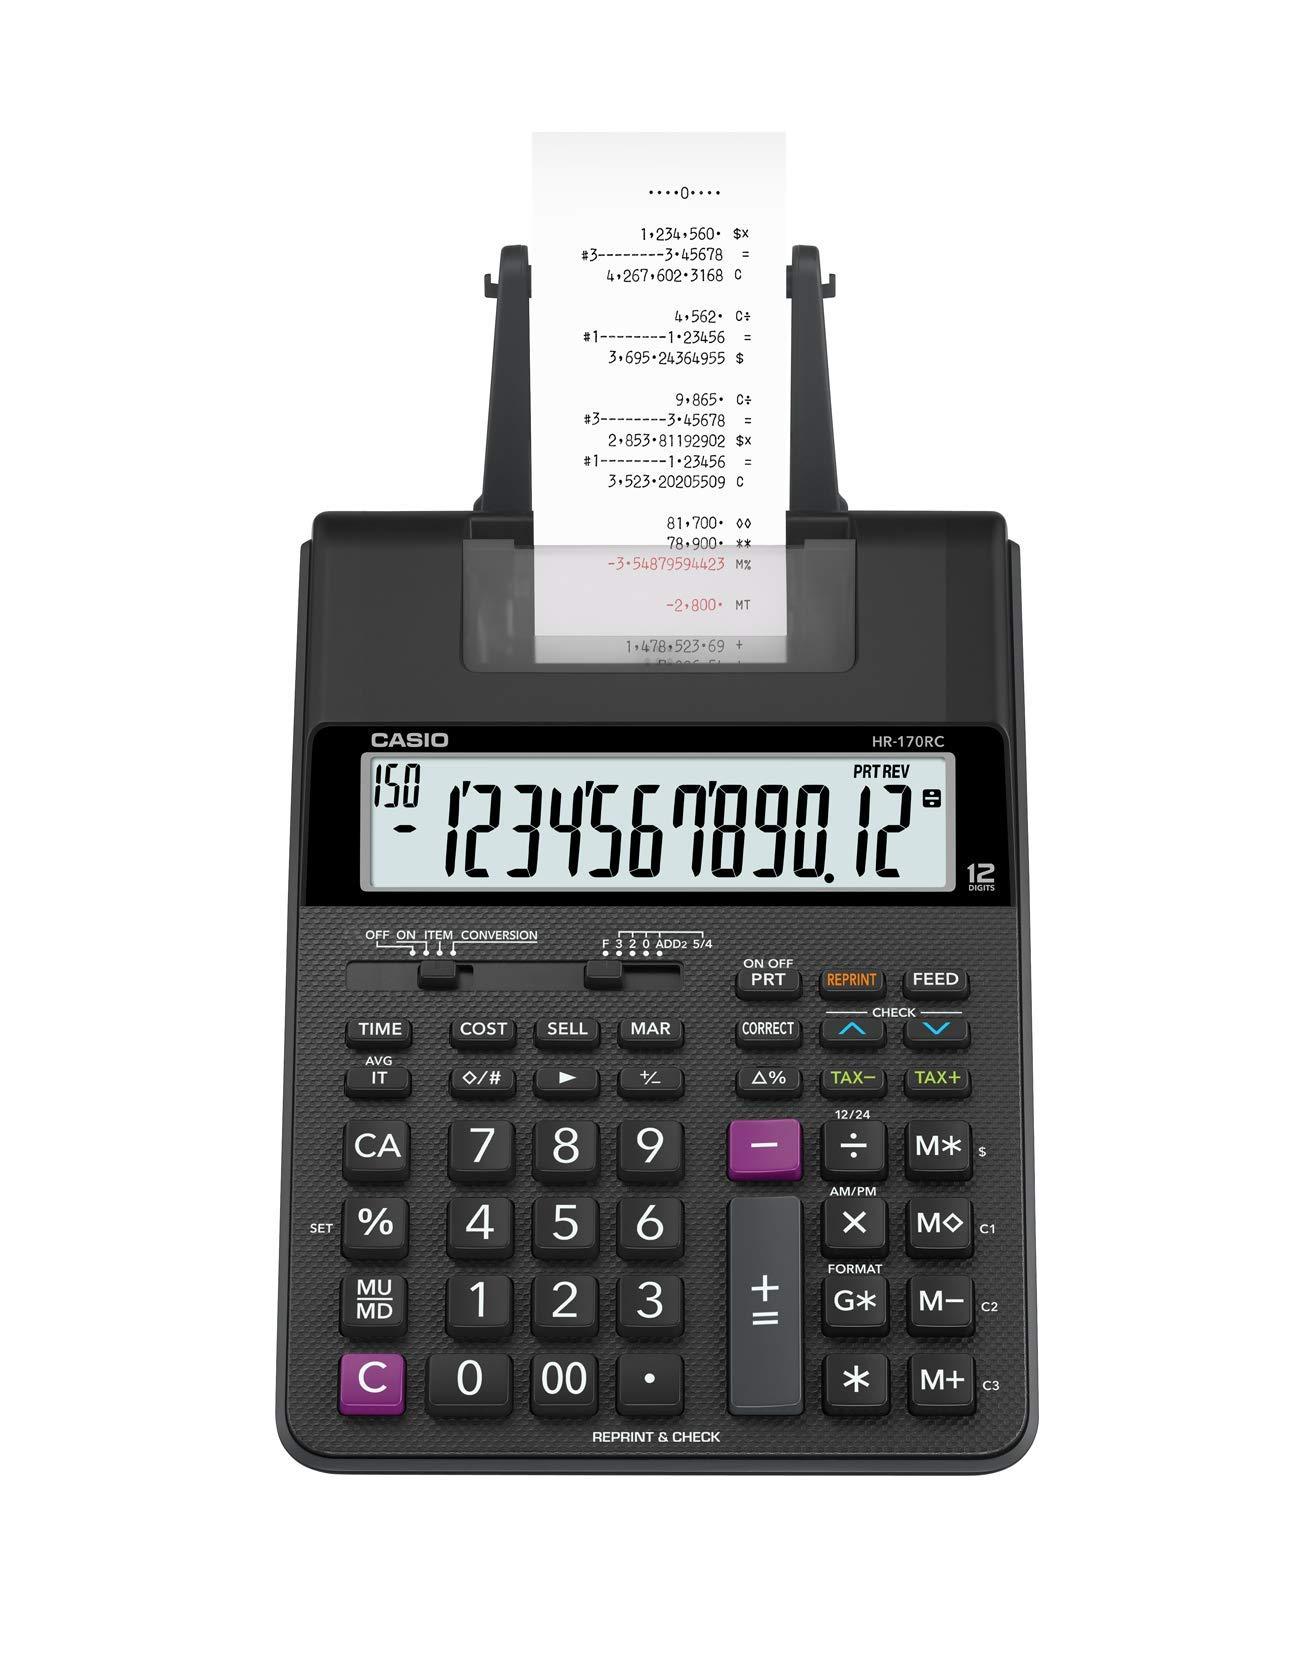 Casio HR-170RC Plus Mini-Desktop Printing Calculator by Casio